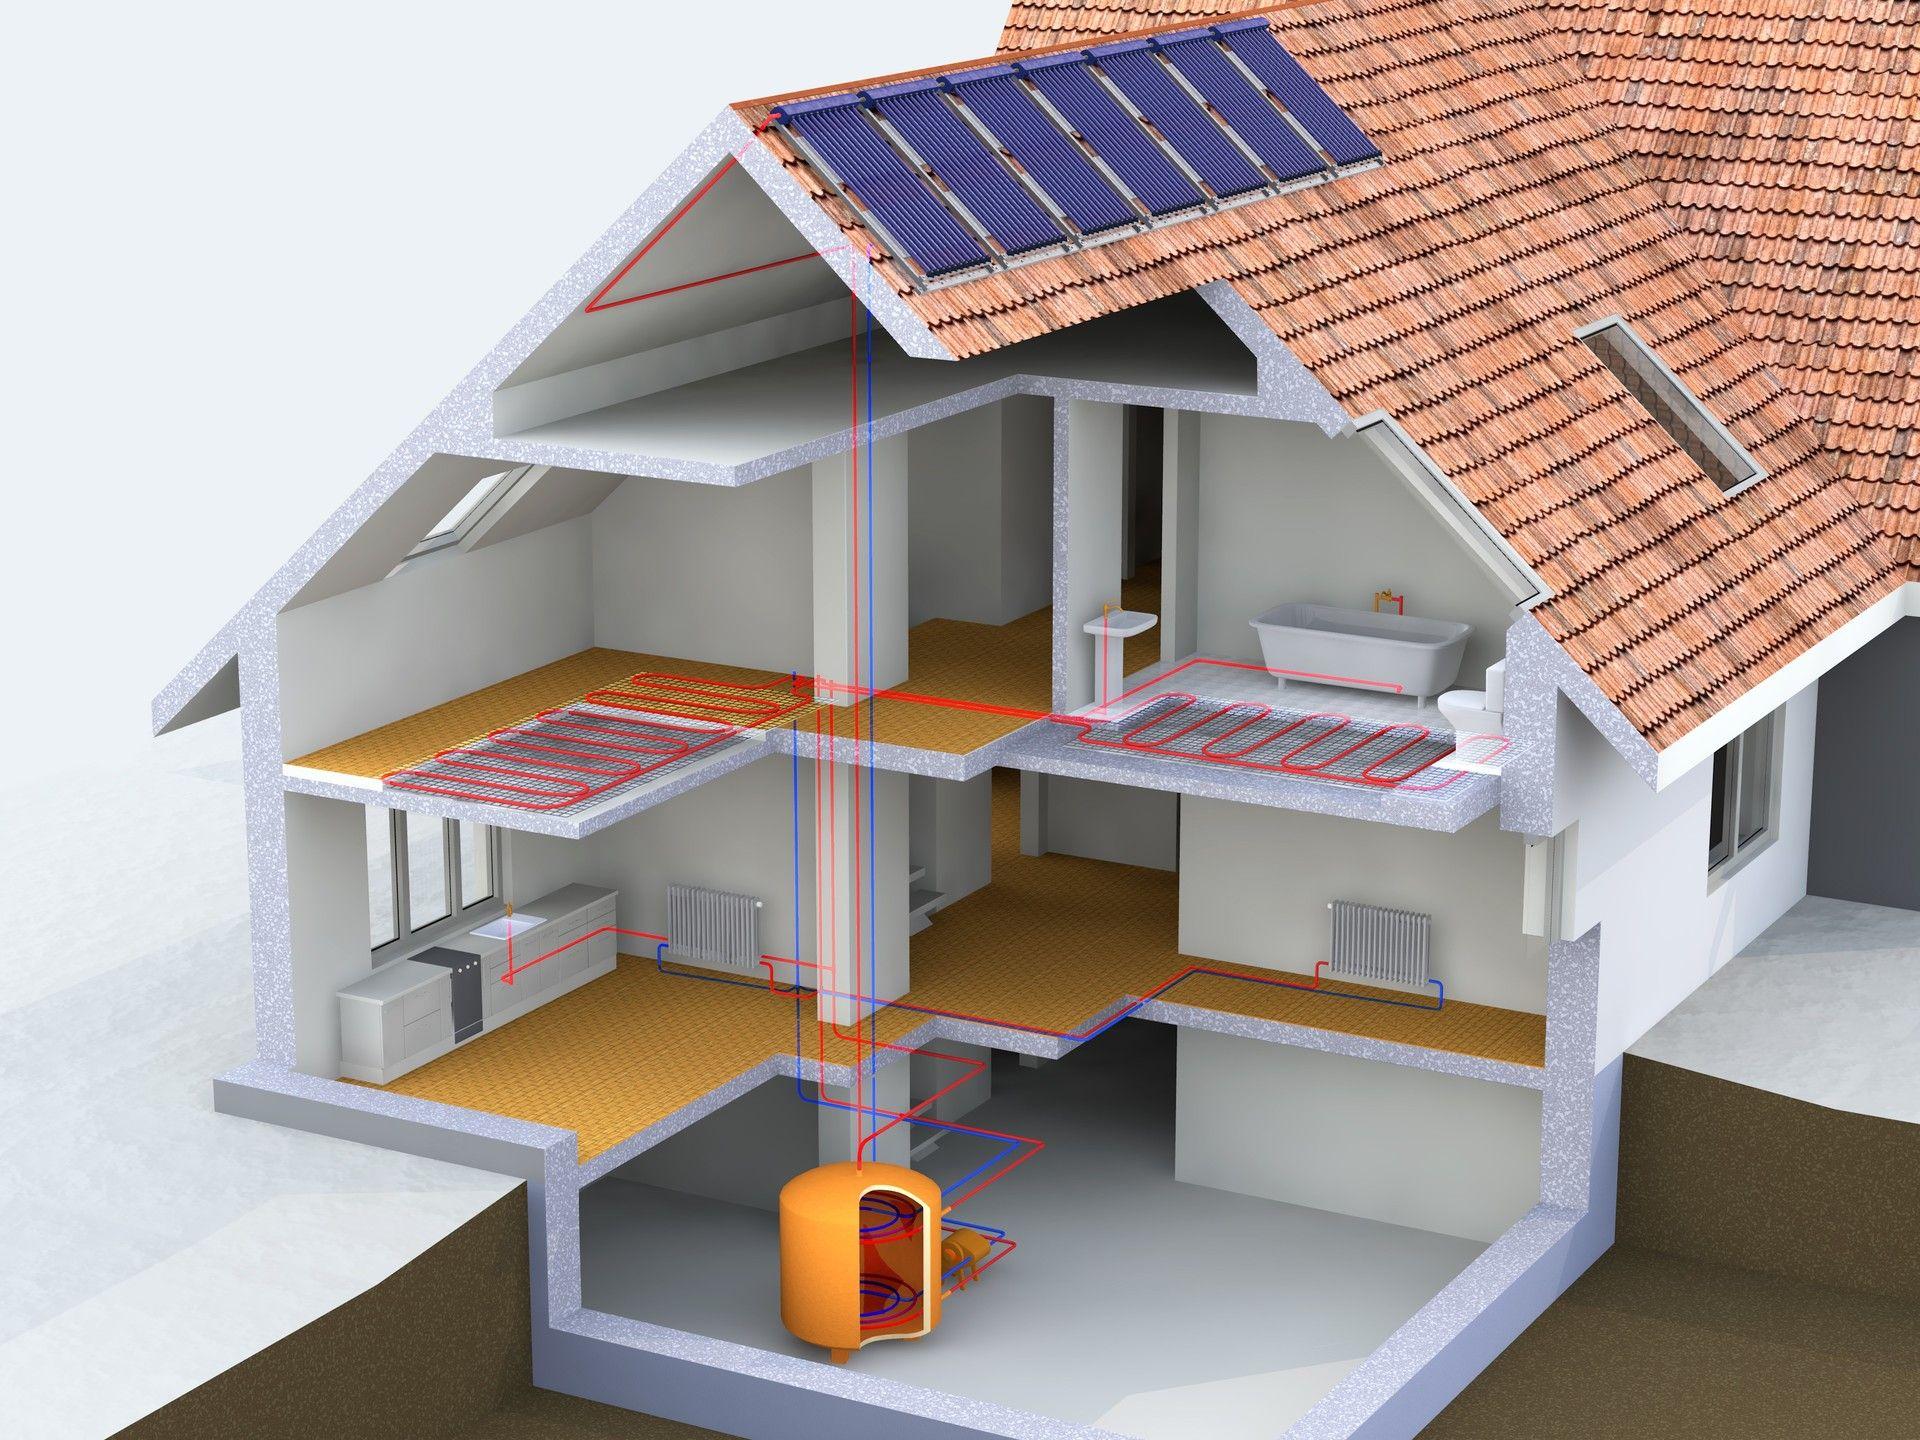 Zonneboiler i.c.m. lucht/water warmtepomp Water, Lucht